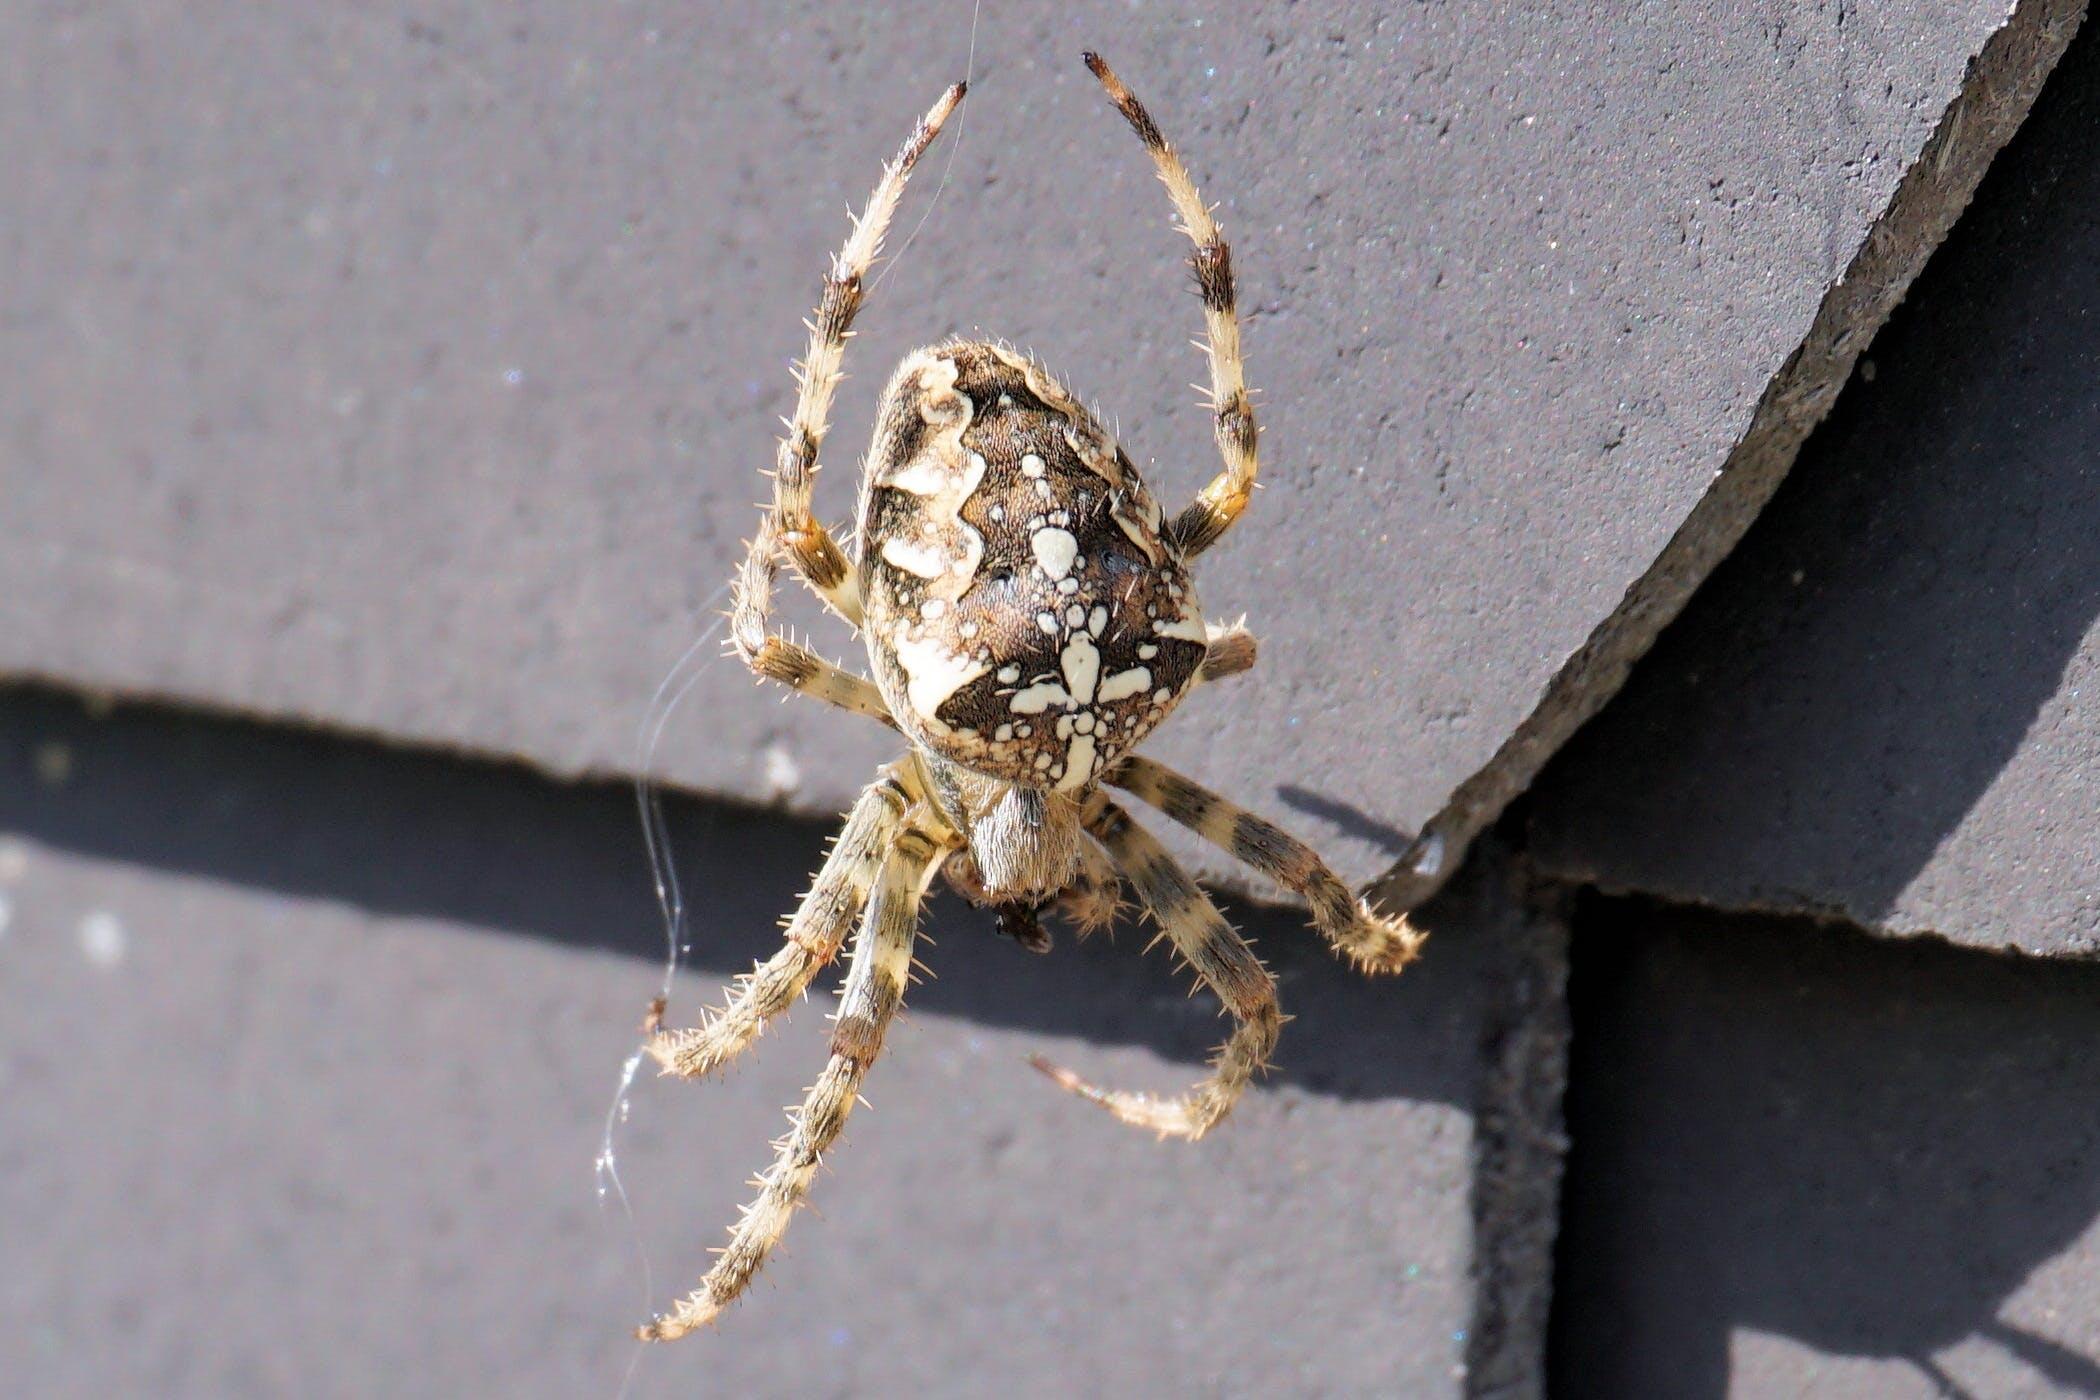 Free stock photo of nature, animal, insect, cobweb